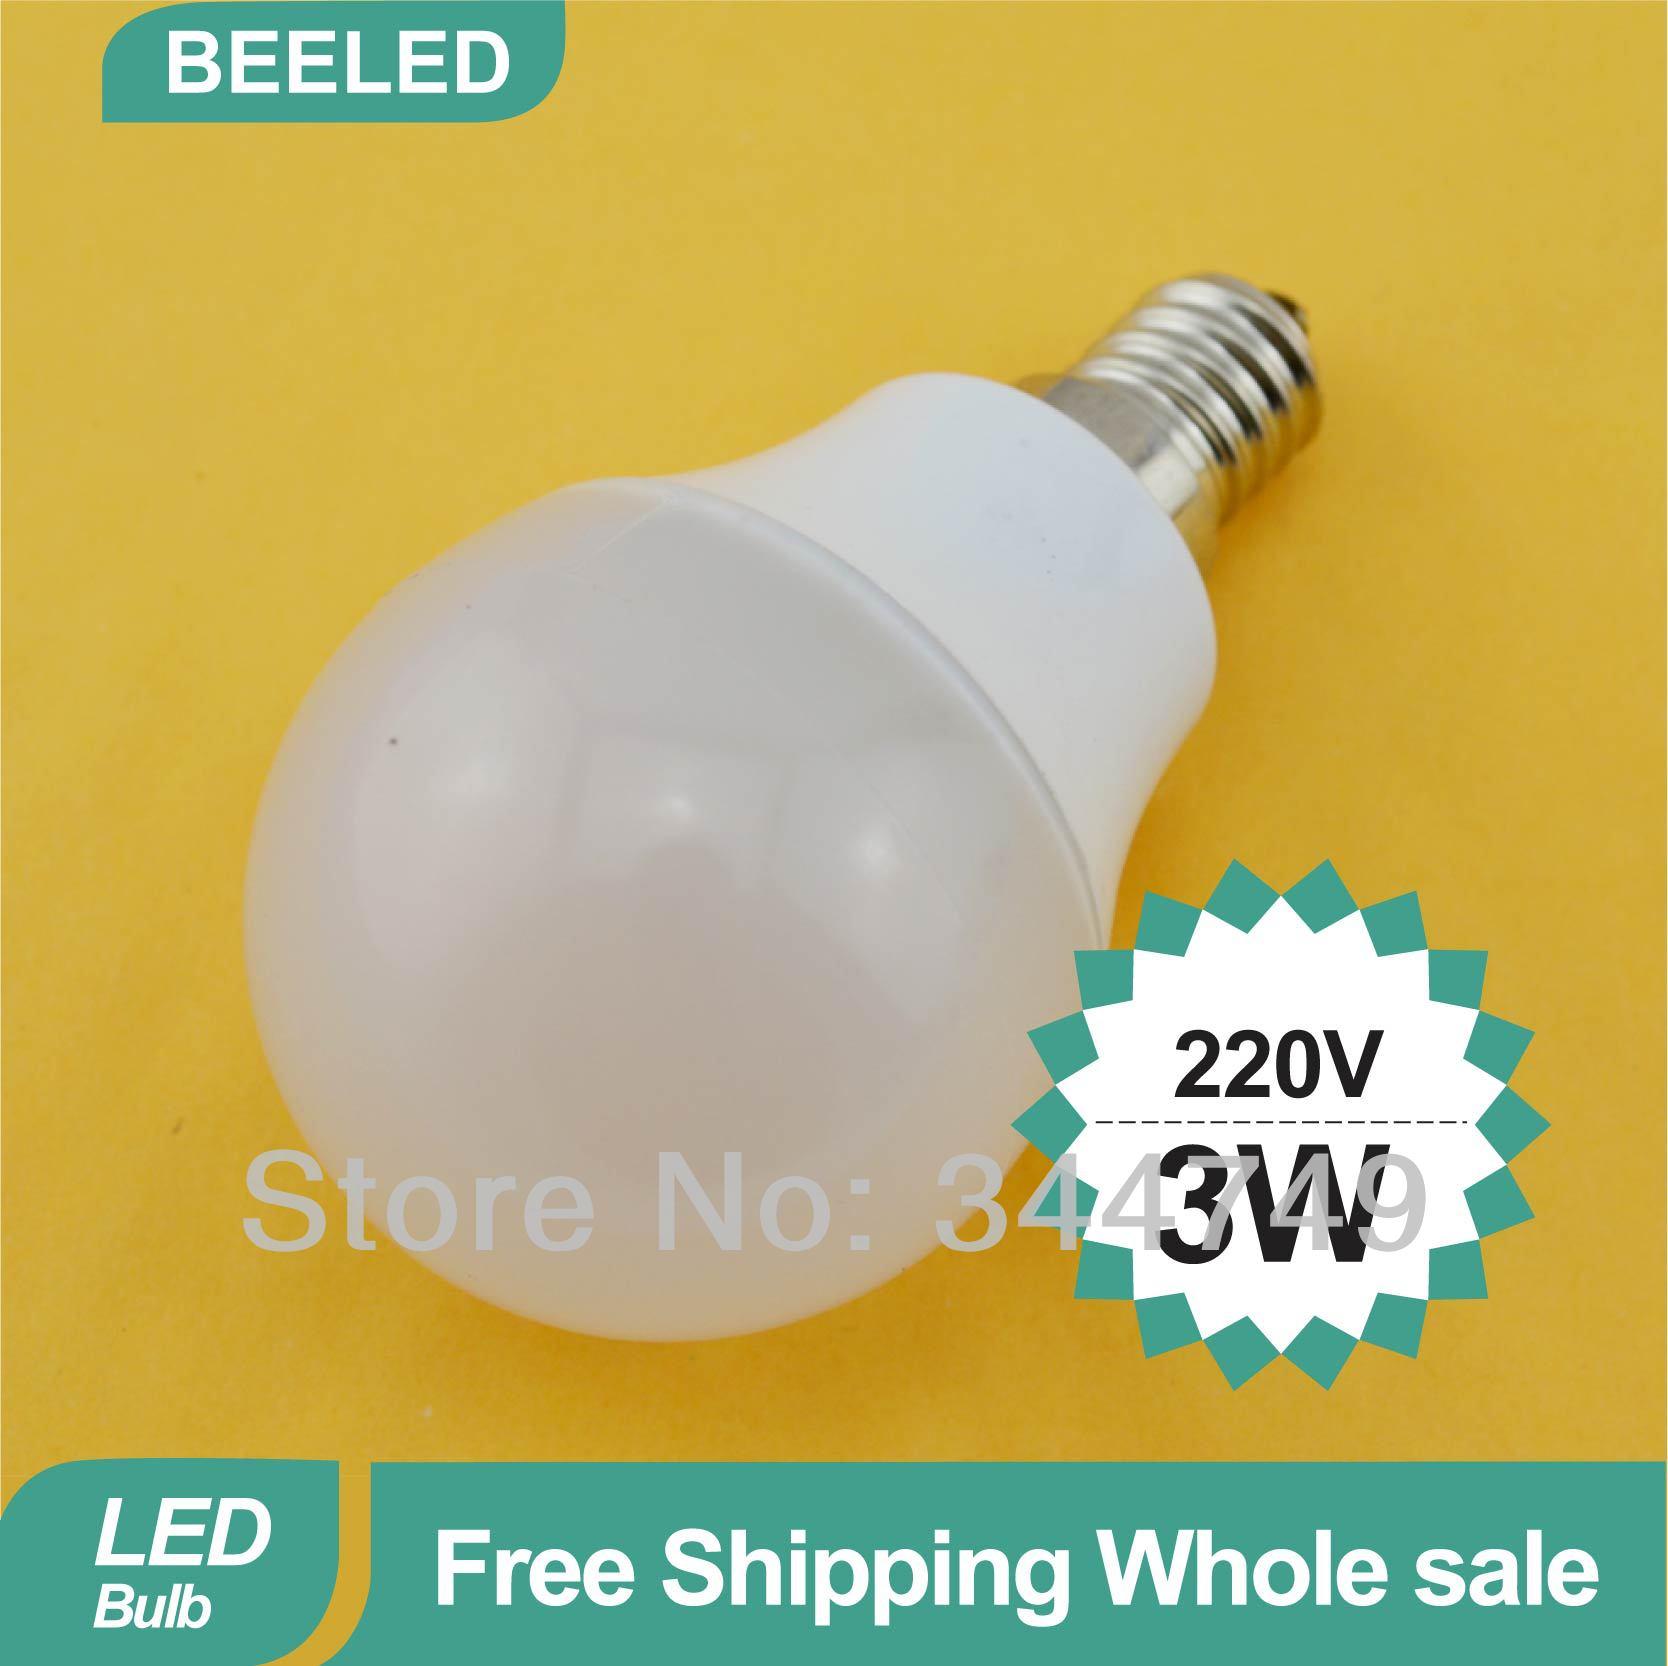 E14 AC220V 240VCool/Warm White 10PCS/lot Light Bulb 2W Freeshipping China Post 2835 SMD High Quality Epistar chip LED Bulb Lamp